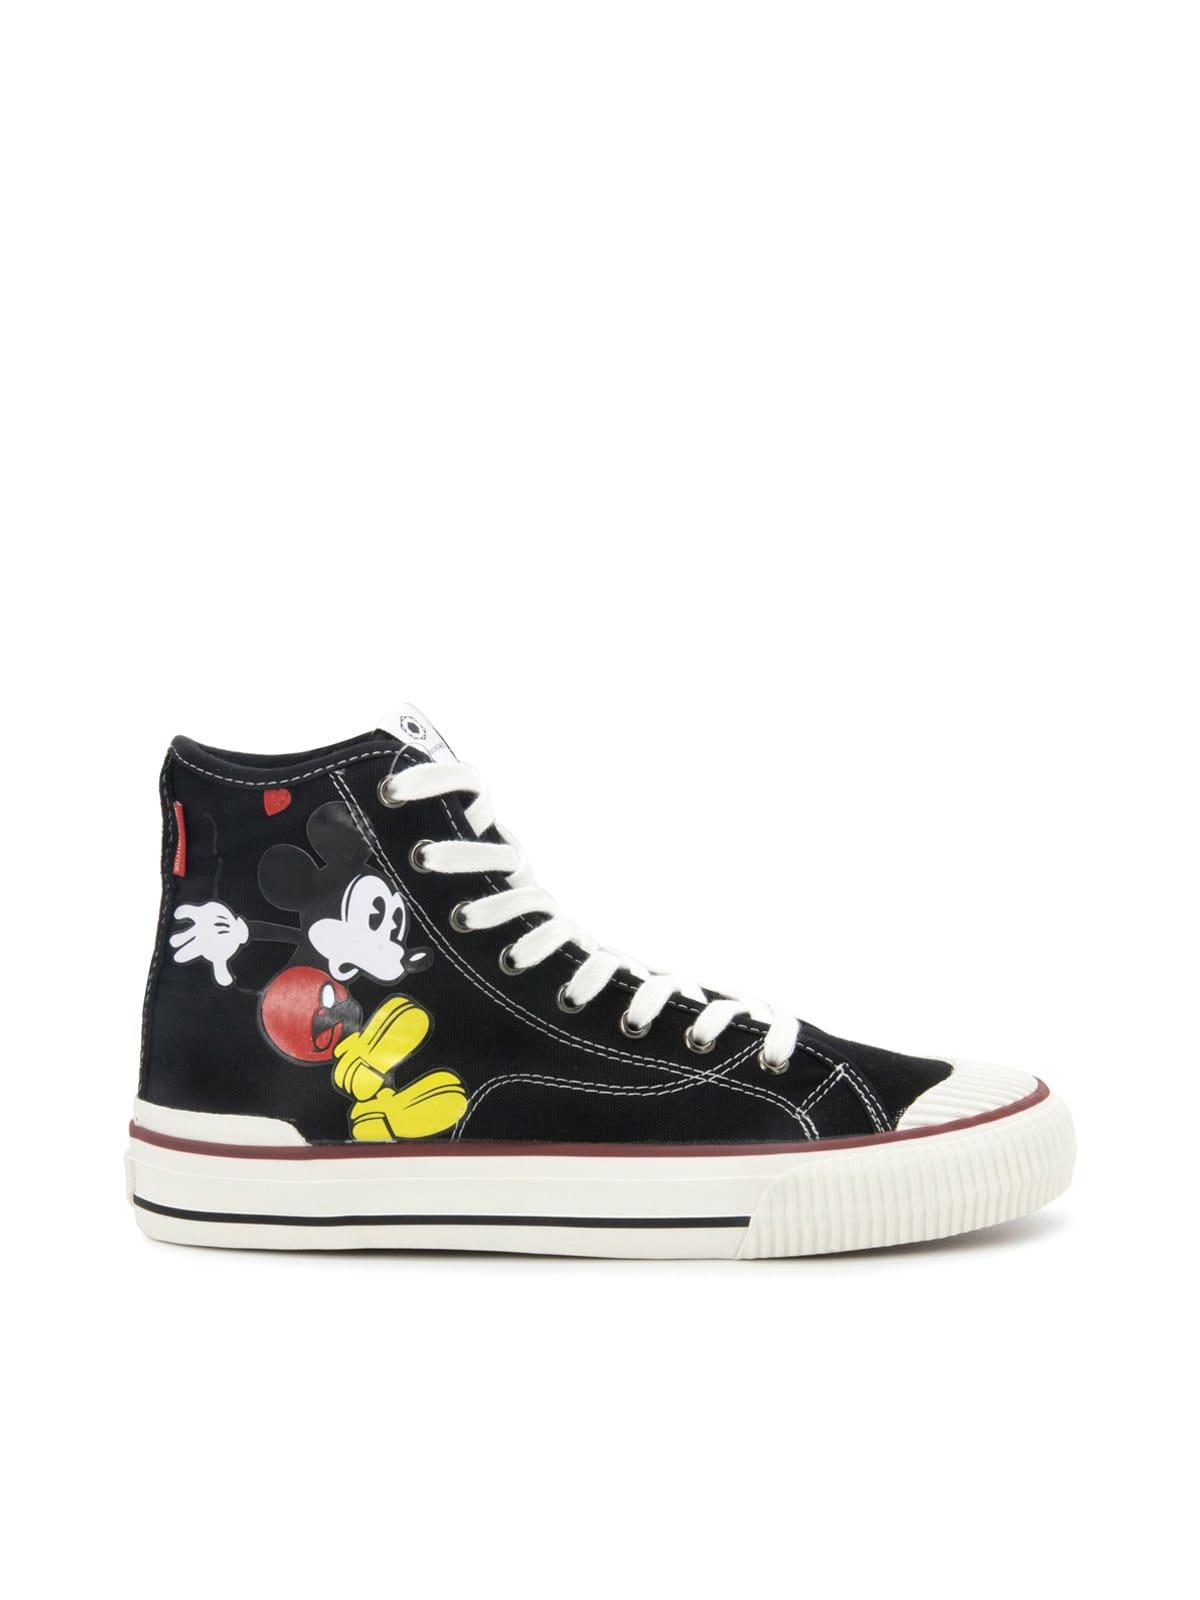 M.o.a. Master Of Arts Shoes KIT HI MICHEY MOUSE PRINTED